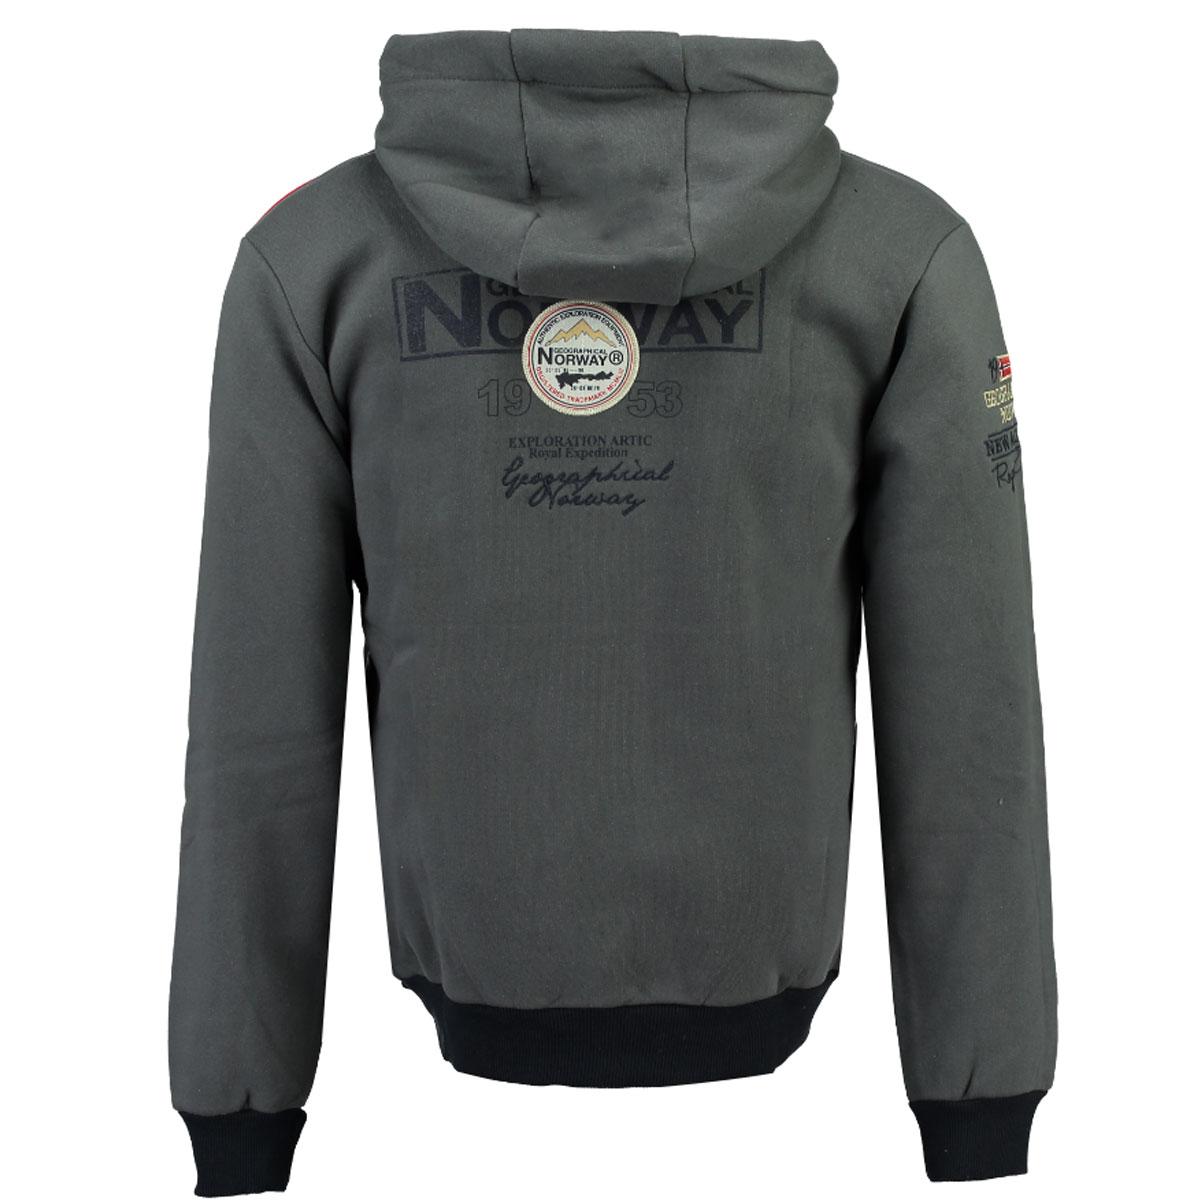 Geographical-Norway-giacca-uomo-autunno-inverno-S-fino-a-3xl-Felpa miniatura 3